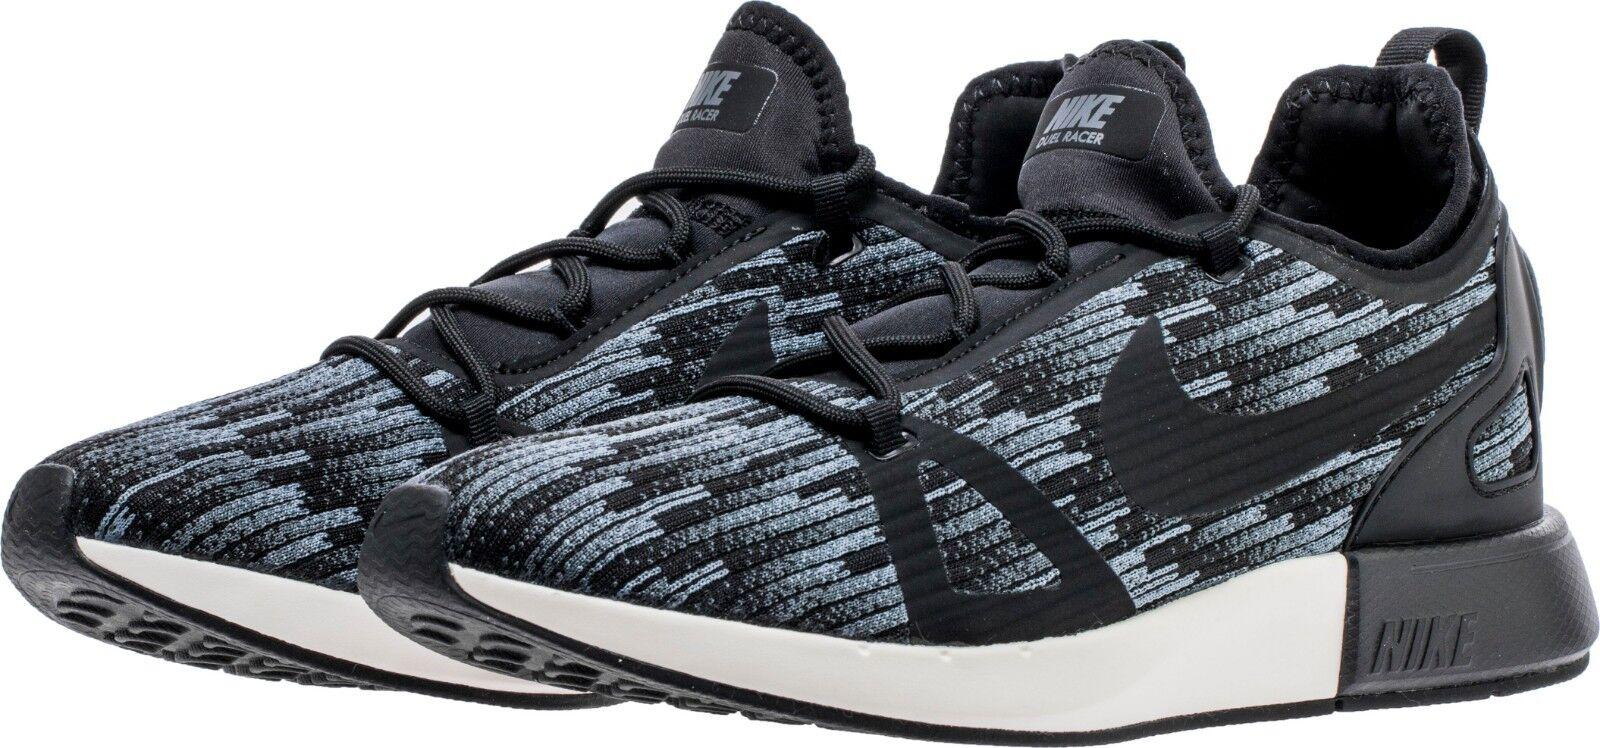 Men's Nike Duel Racer SE Running SHOES SIZE 12 125 AH7359 001